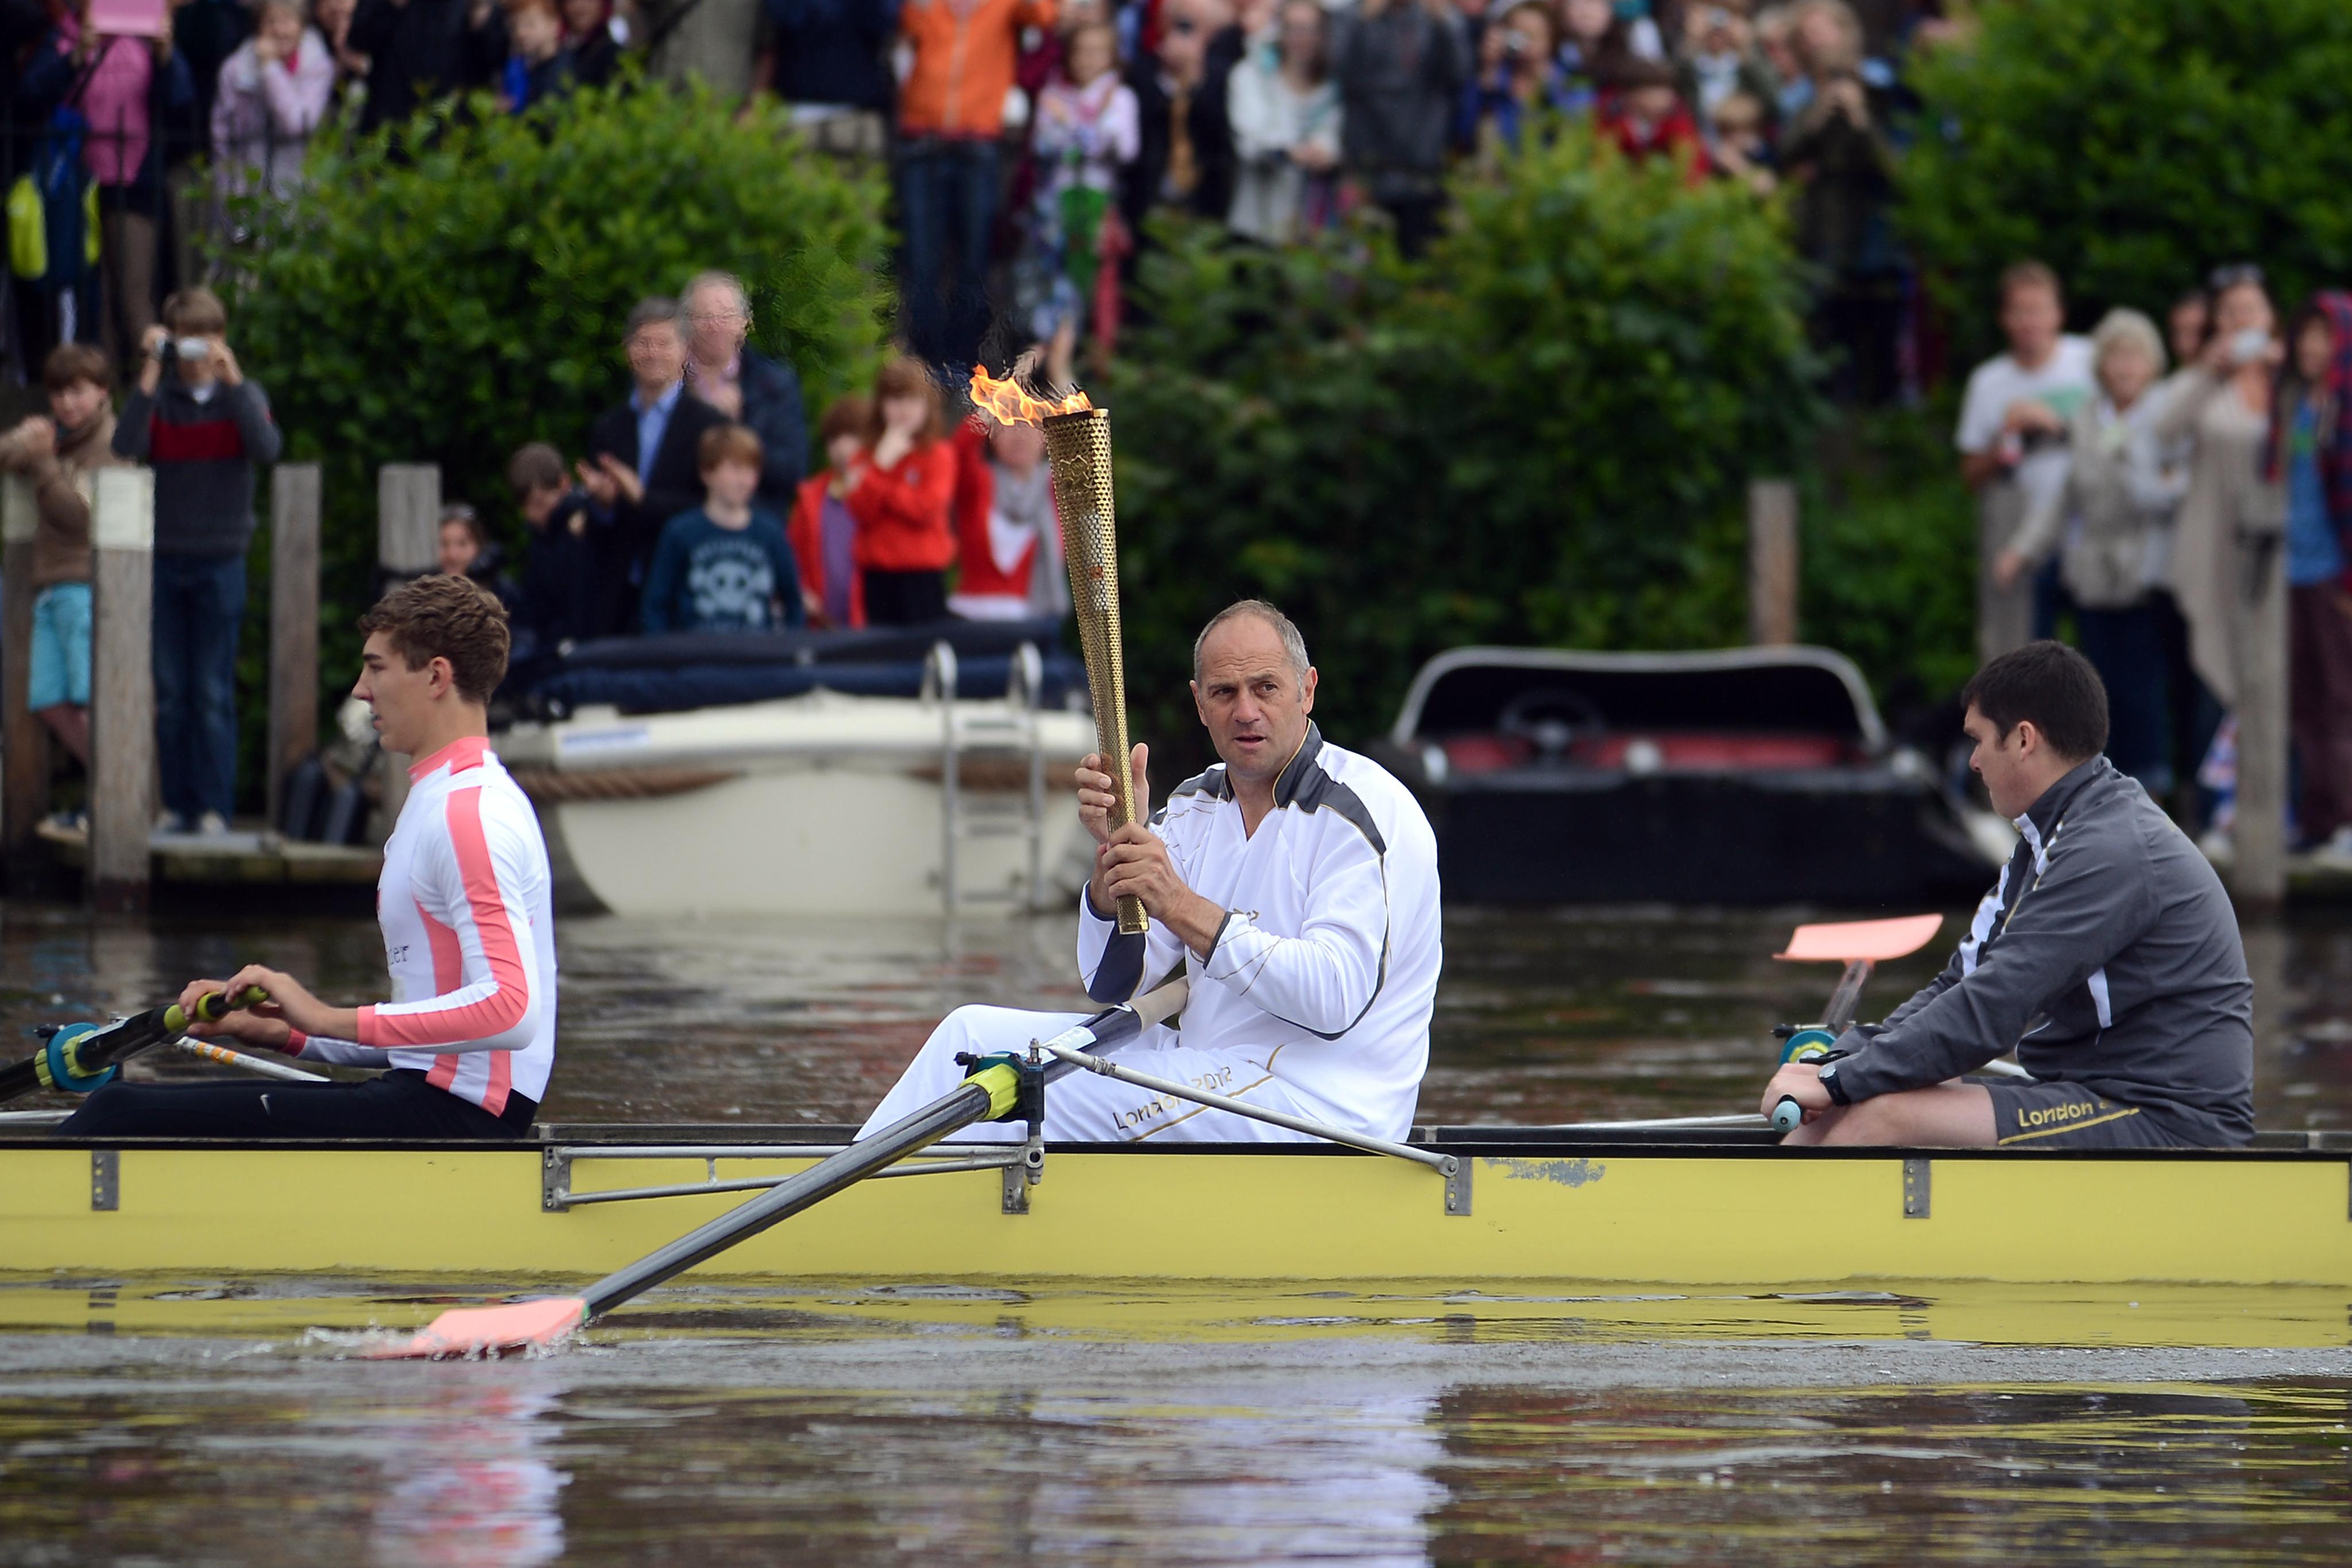 Is rowing hard?